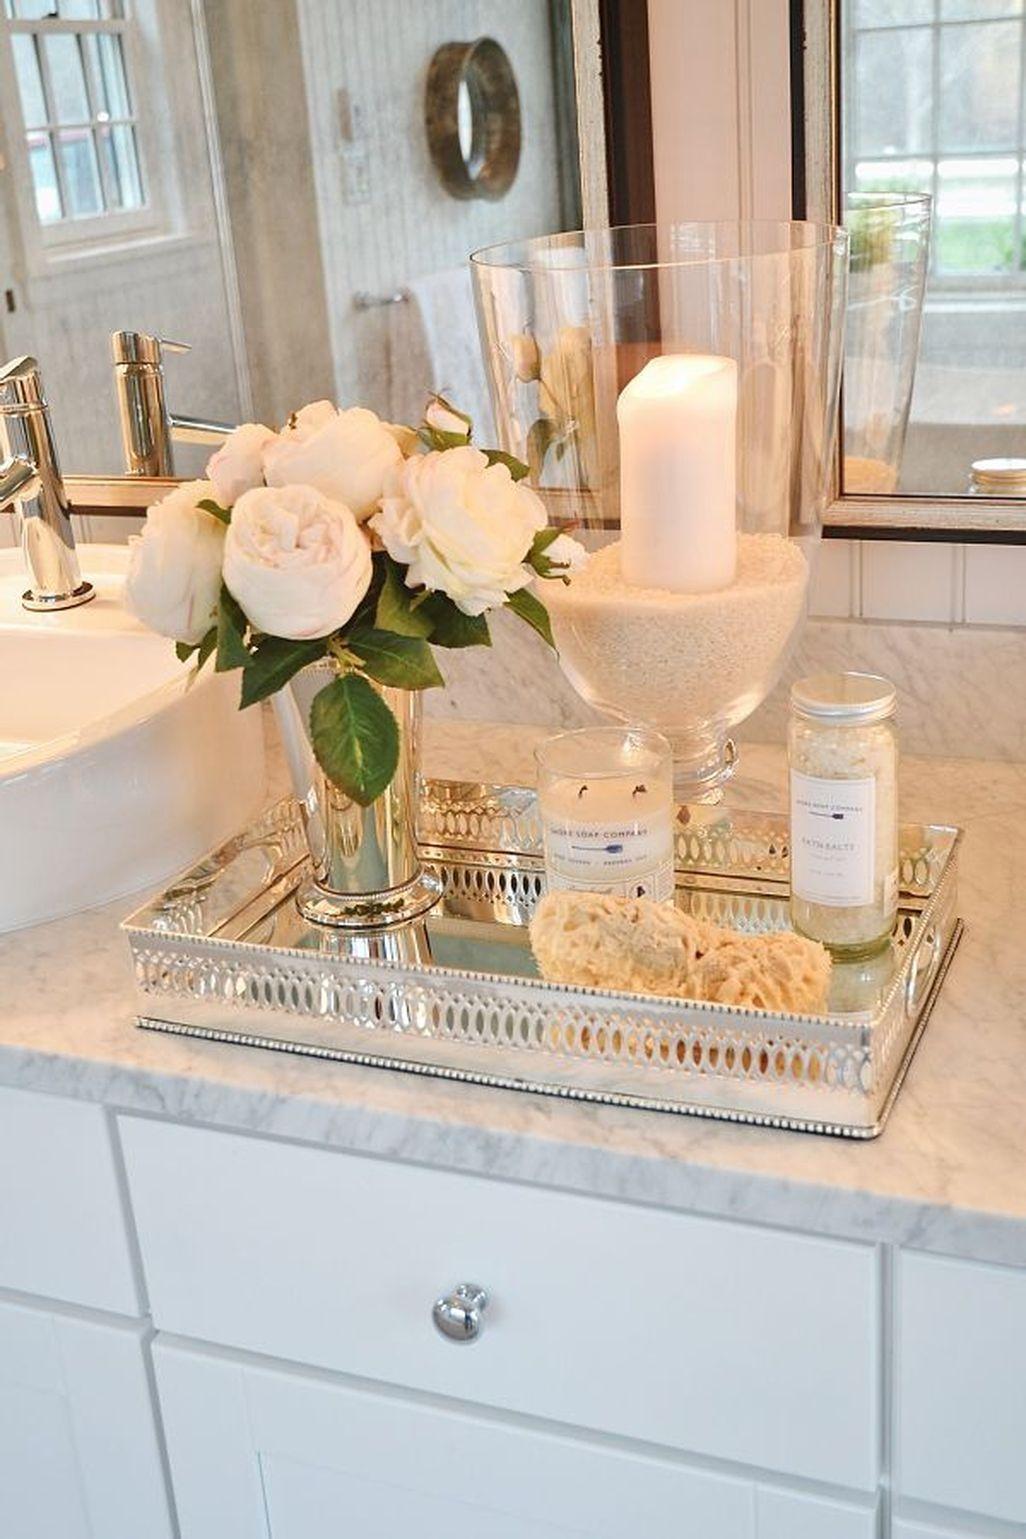 Awesome 50 Amazing Master Bedroom Decor Ideas More At Https 50homedesign Com 2018 03 05 50 Amazing Master Bedro Counter Decor Hgtv Dream Home Bathroom Decor